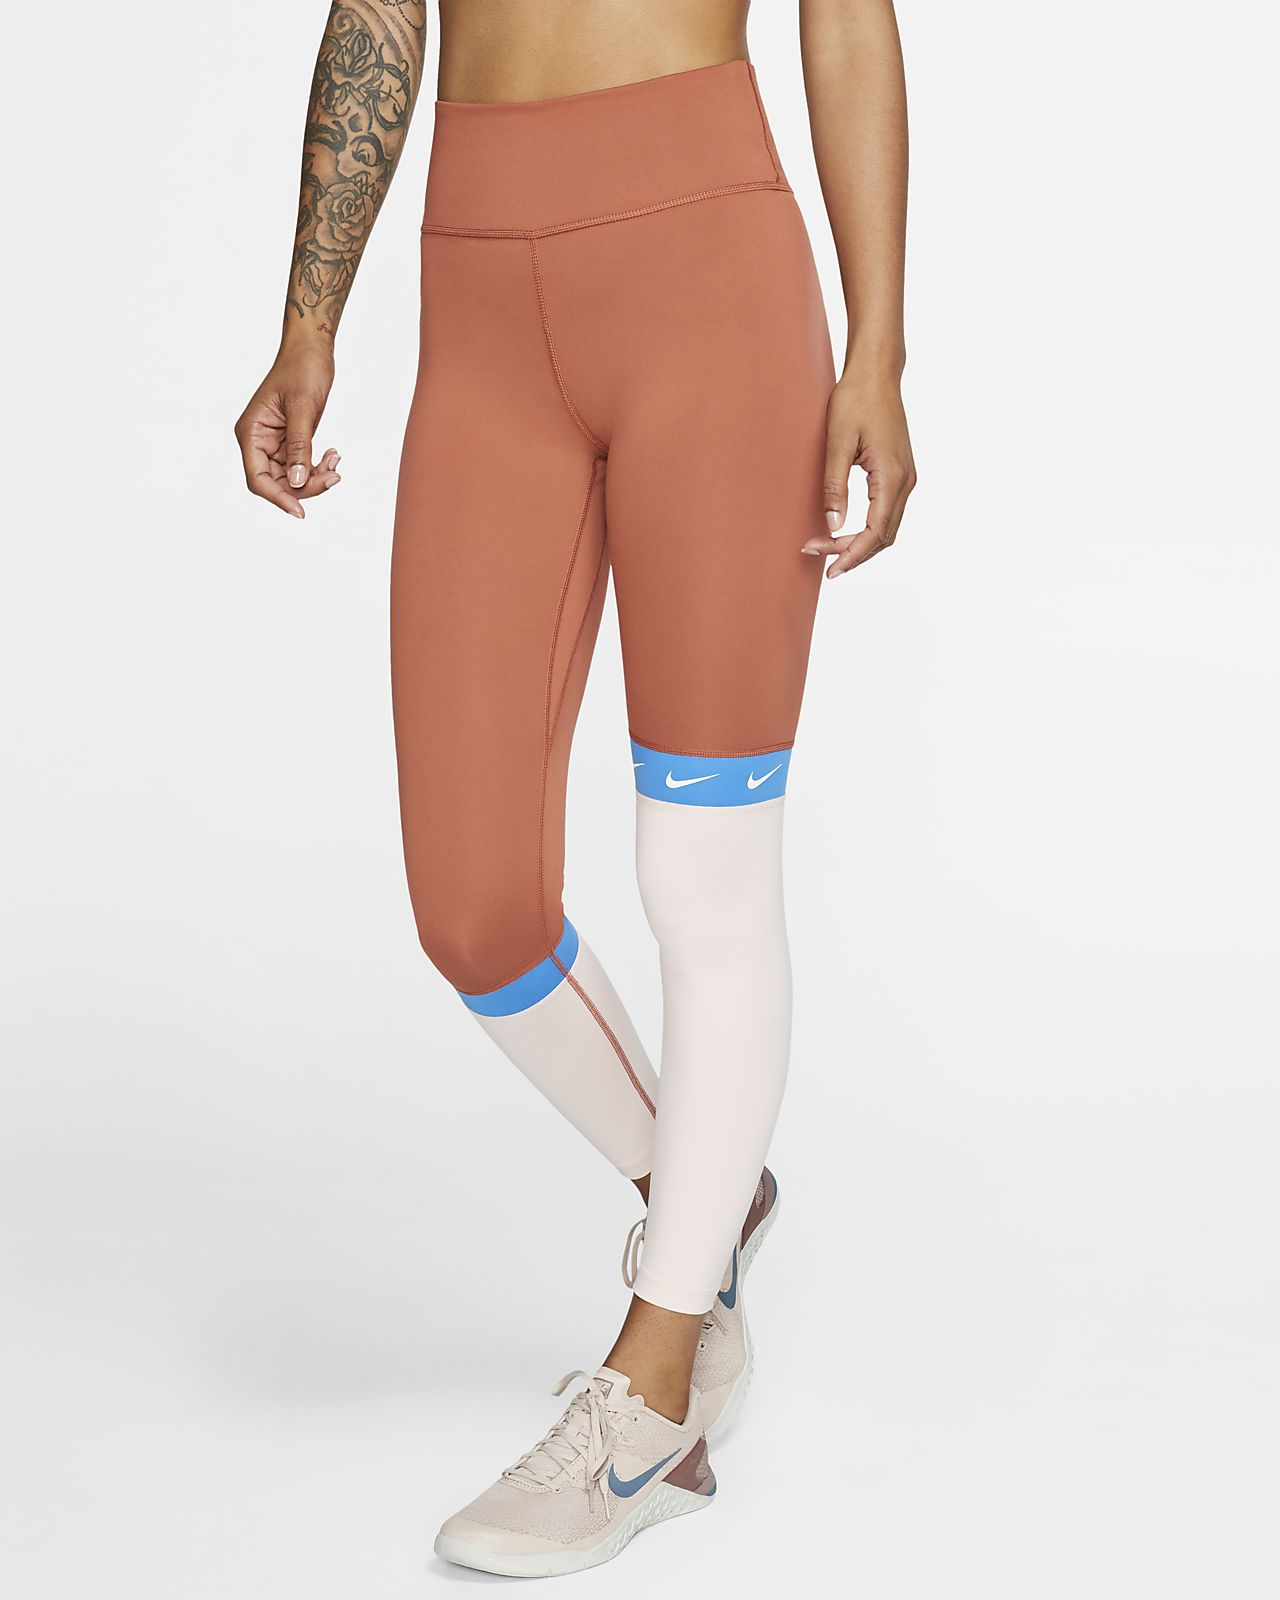 Nike One 7/8 Kadın Taytı